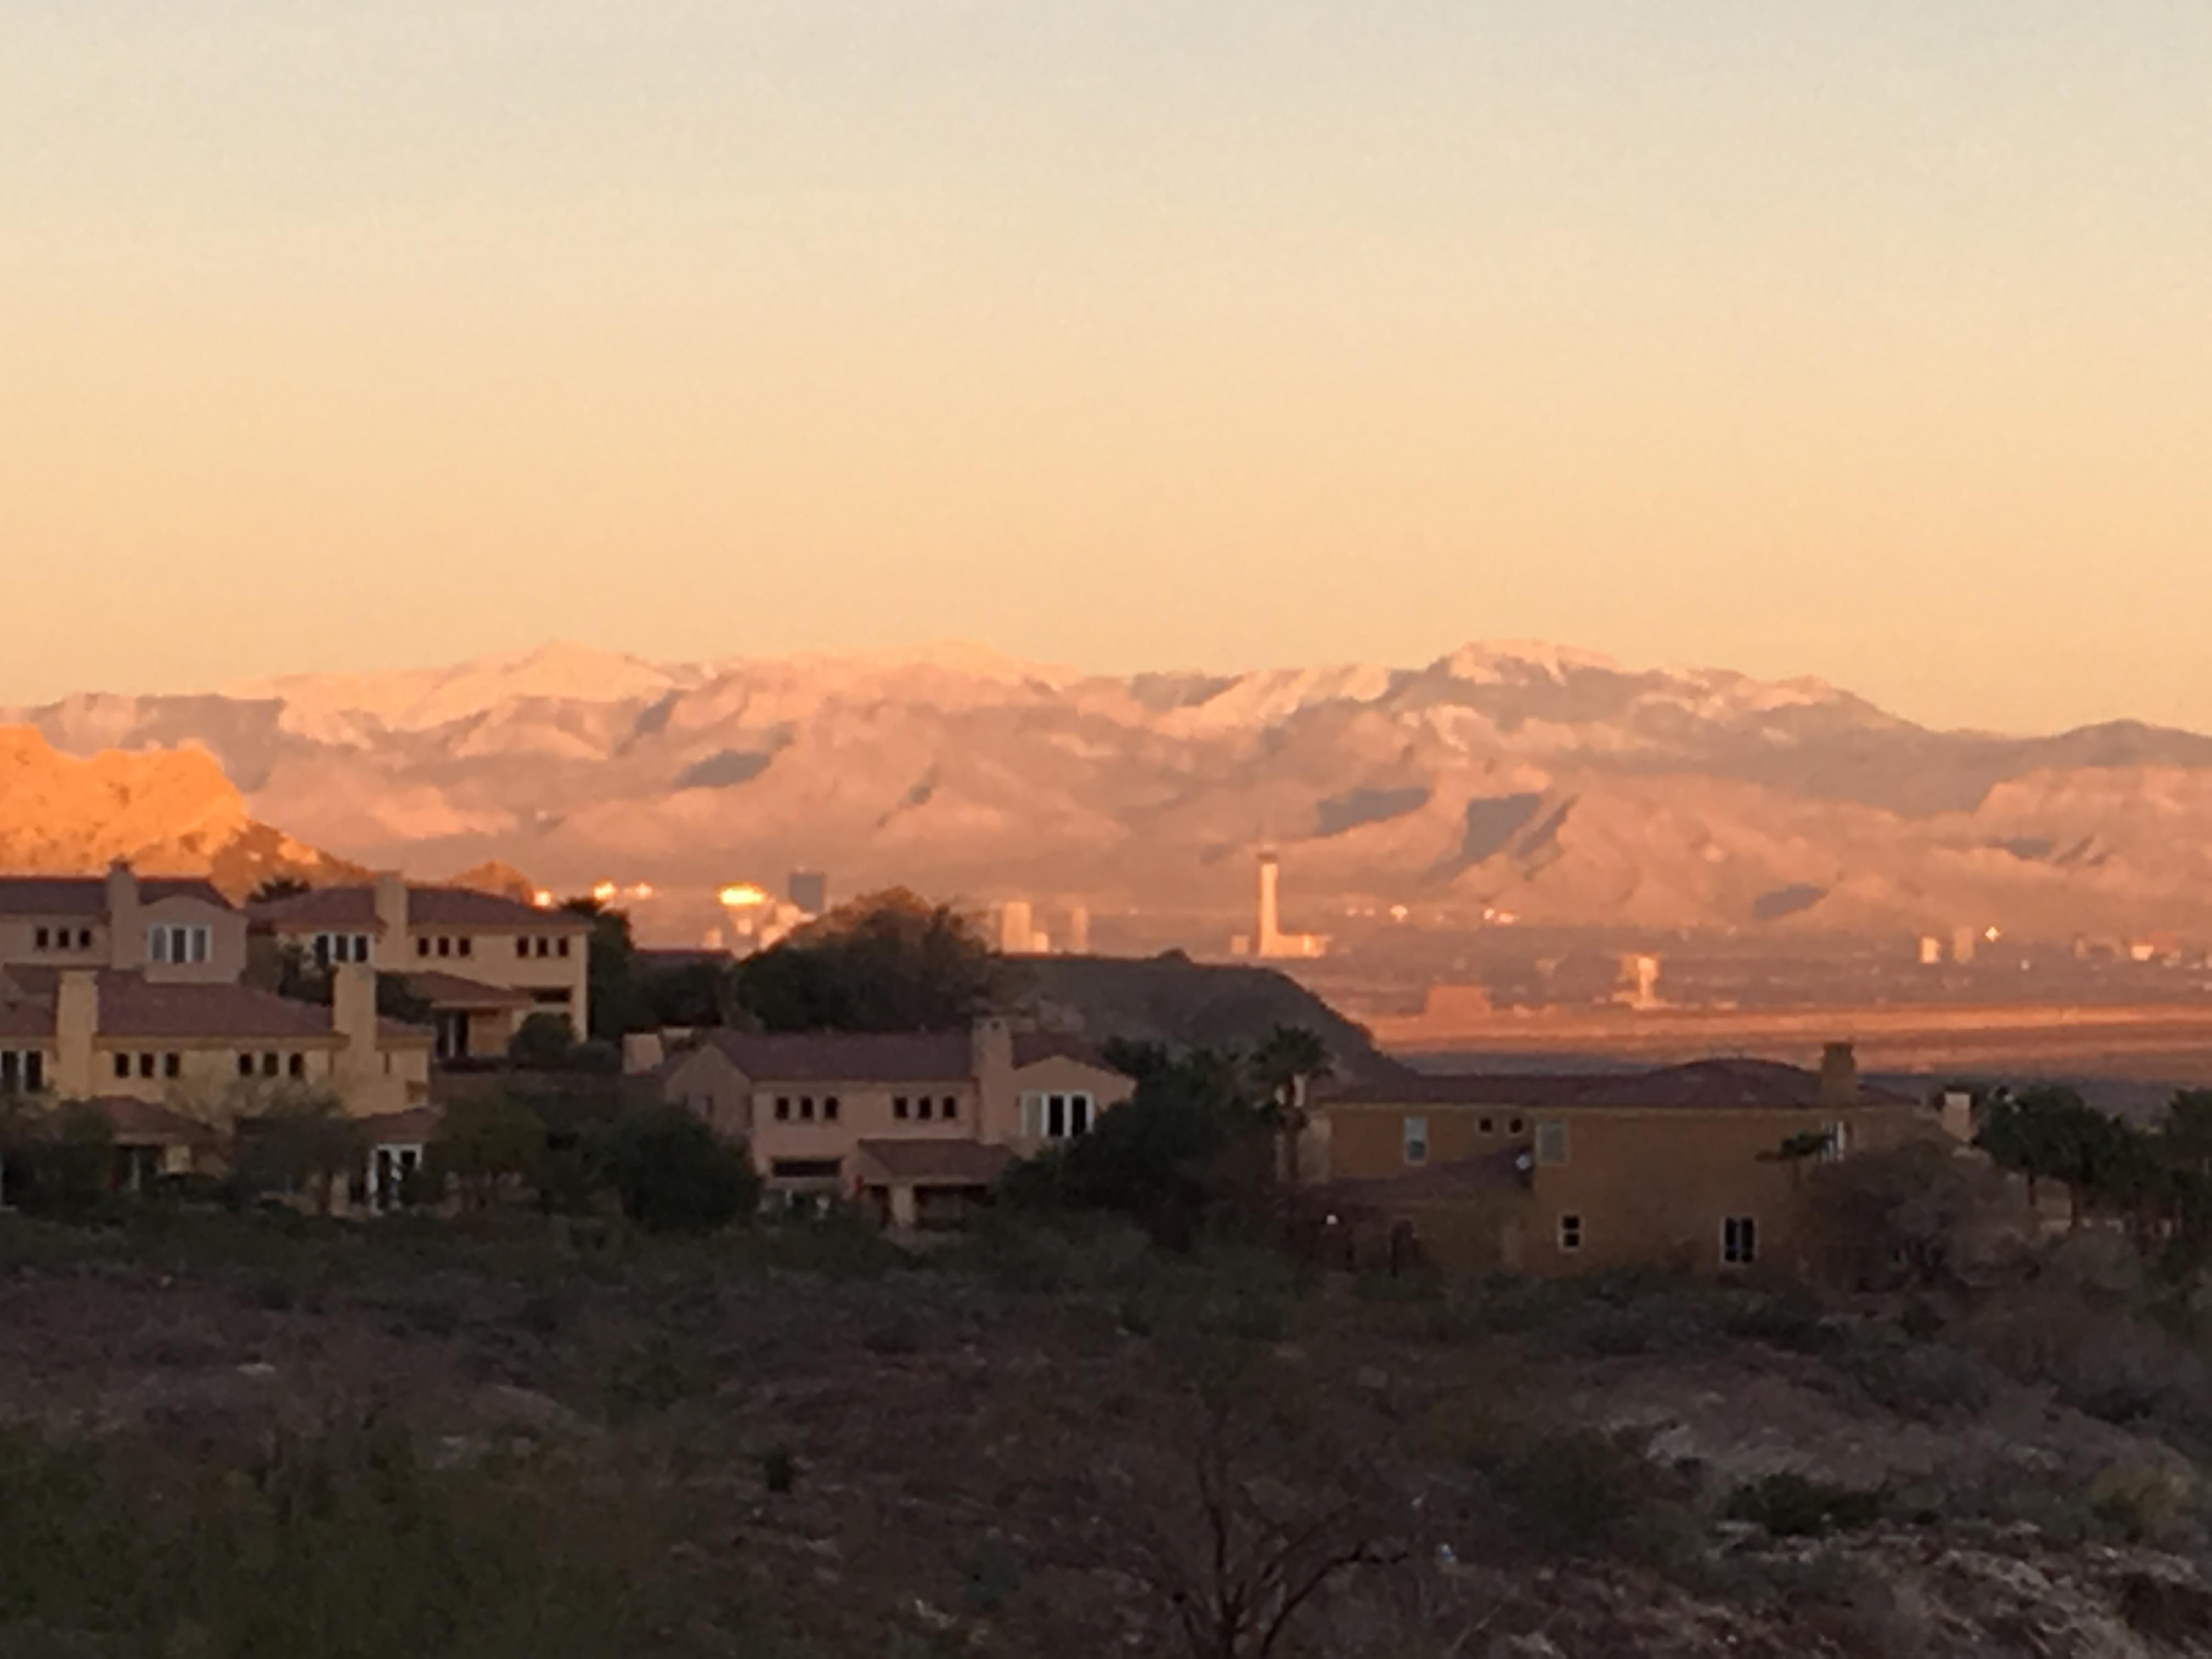 View from top of neighborhood